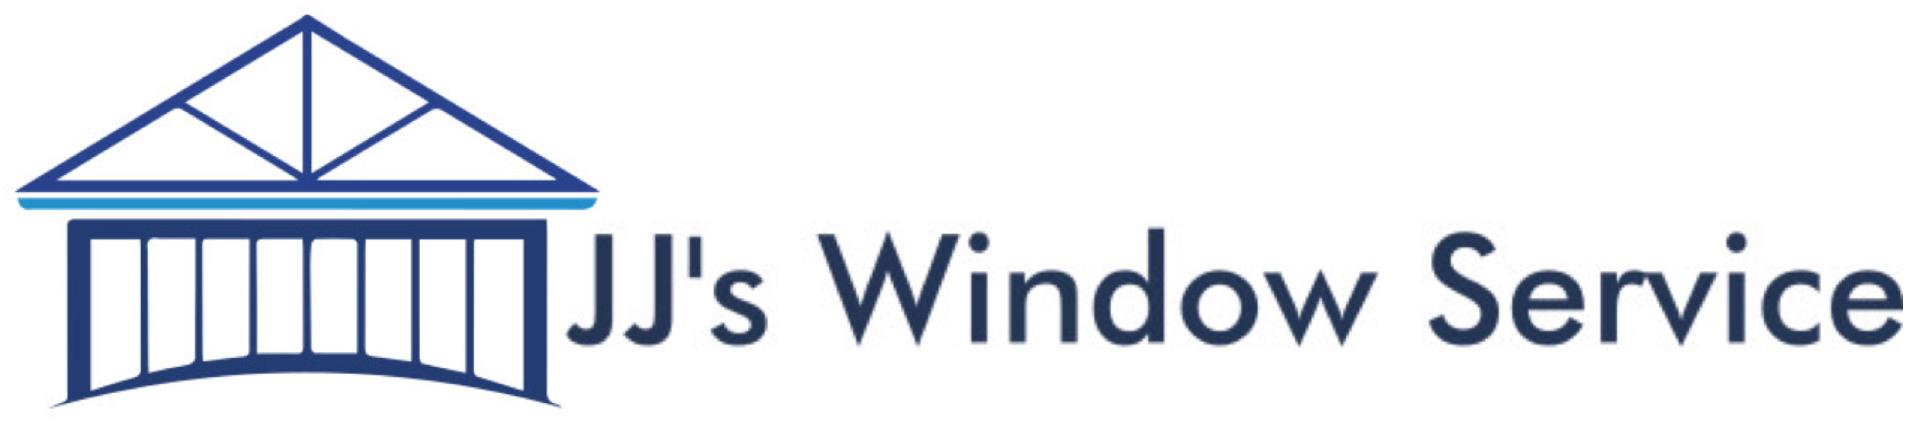 JJ's Window Service | Repair & Replace